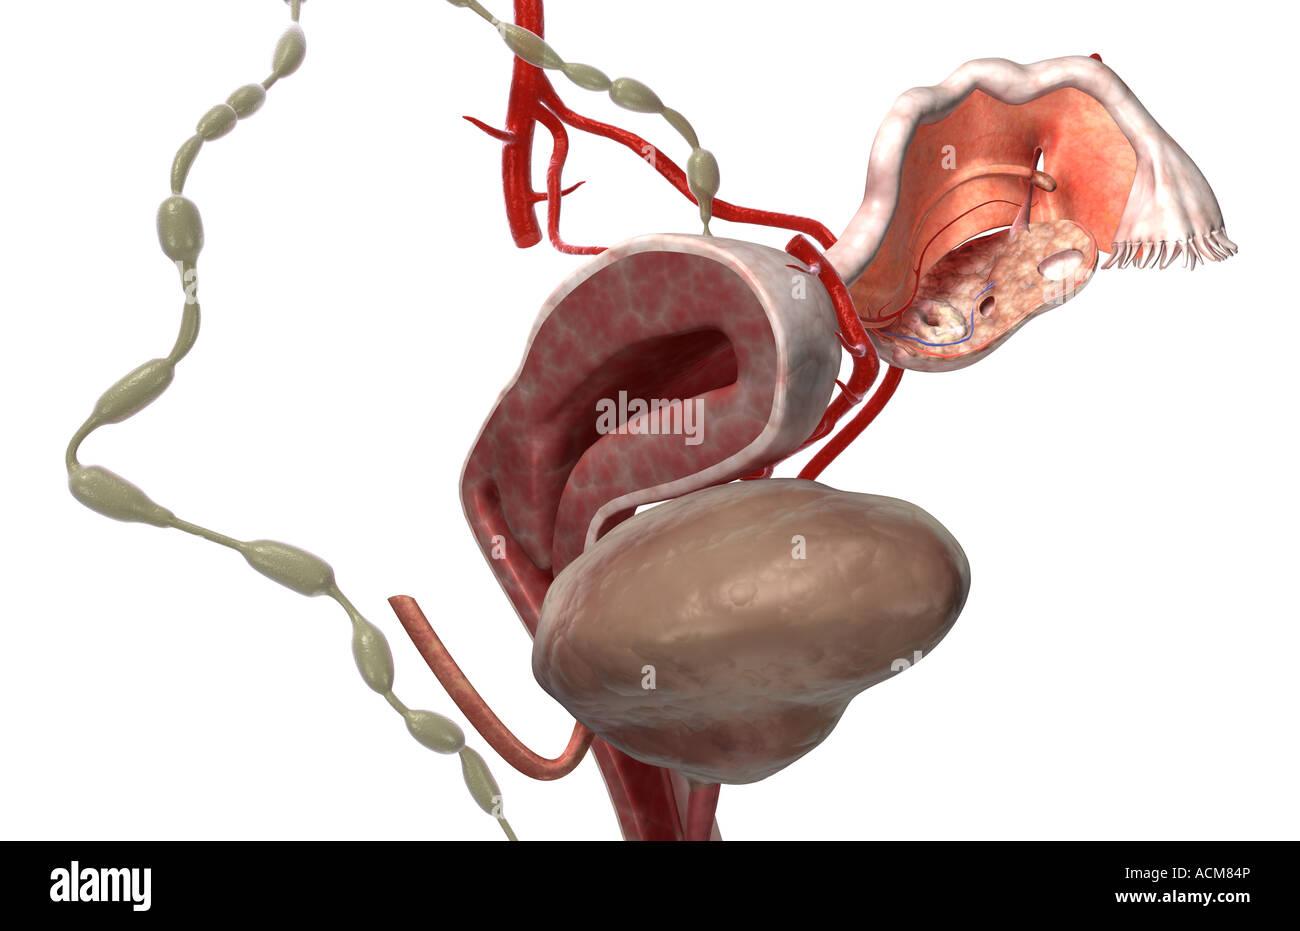 Illustration Of Anatomy Of Cervix Imágenes De Stock & Illustration ...